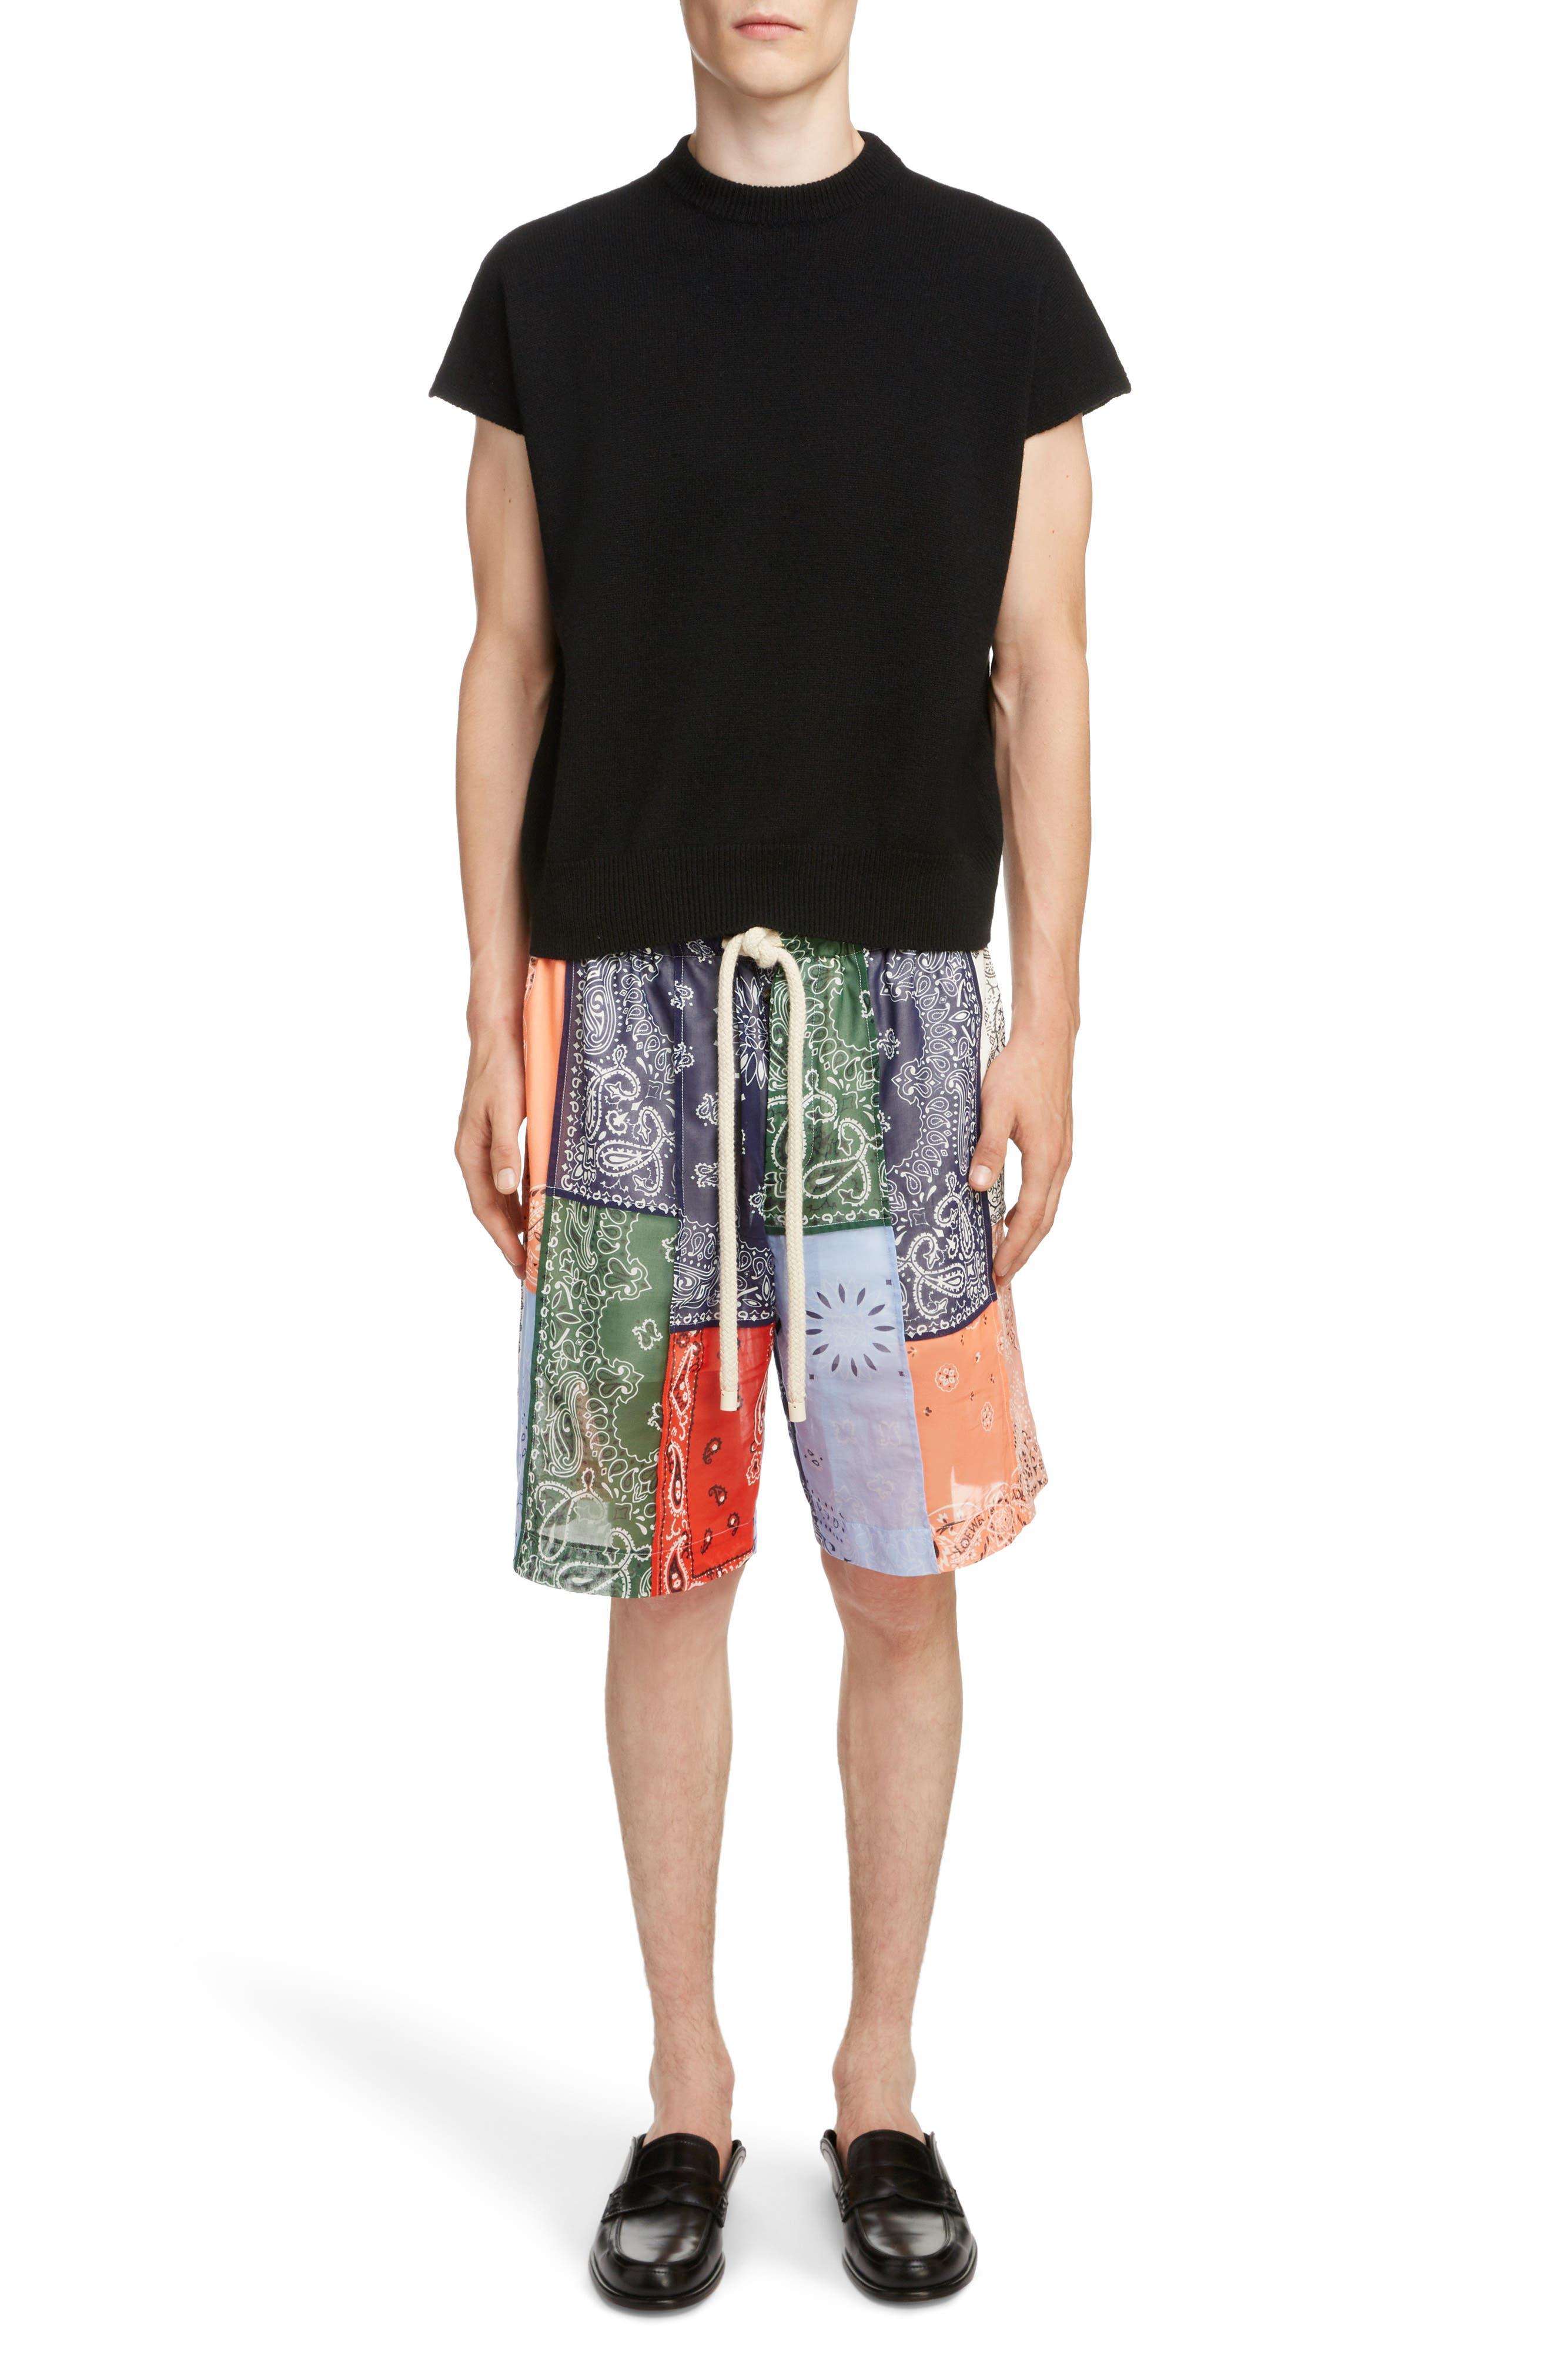 LOEWE, Bandana Patchwork Shorts, Alternate thumbnail 6, color, 9990-MULTICOLOR